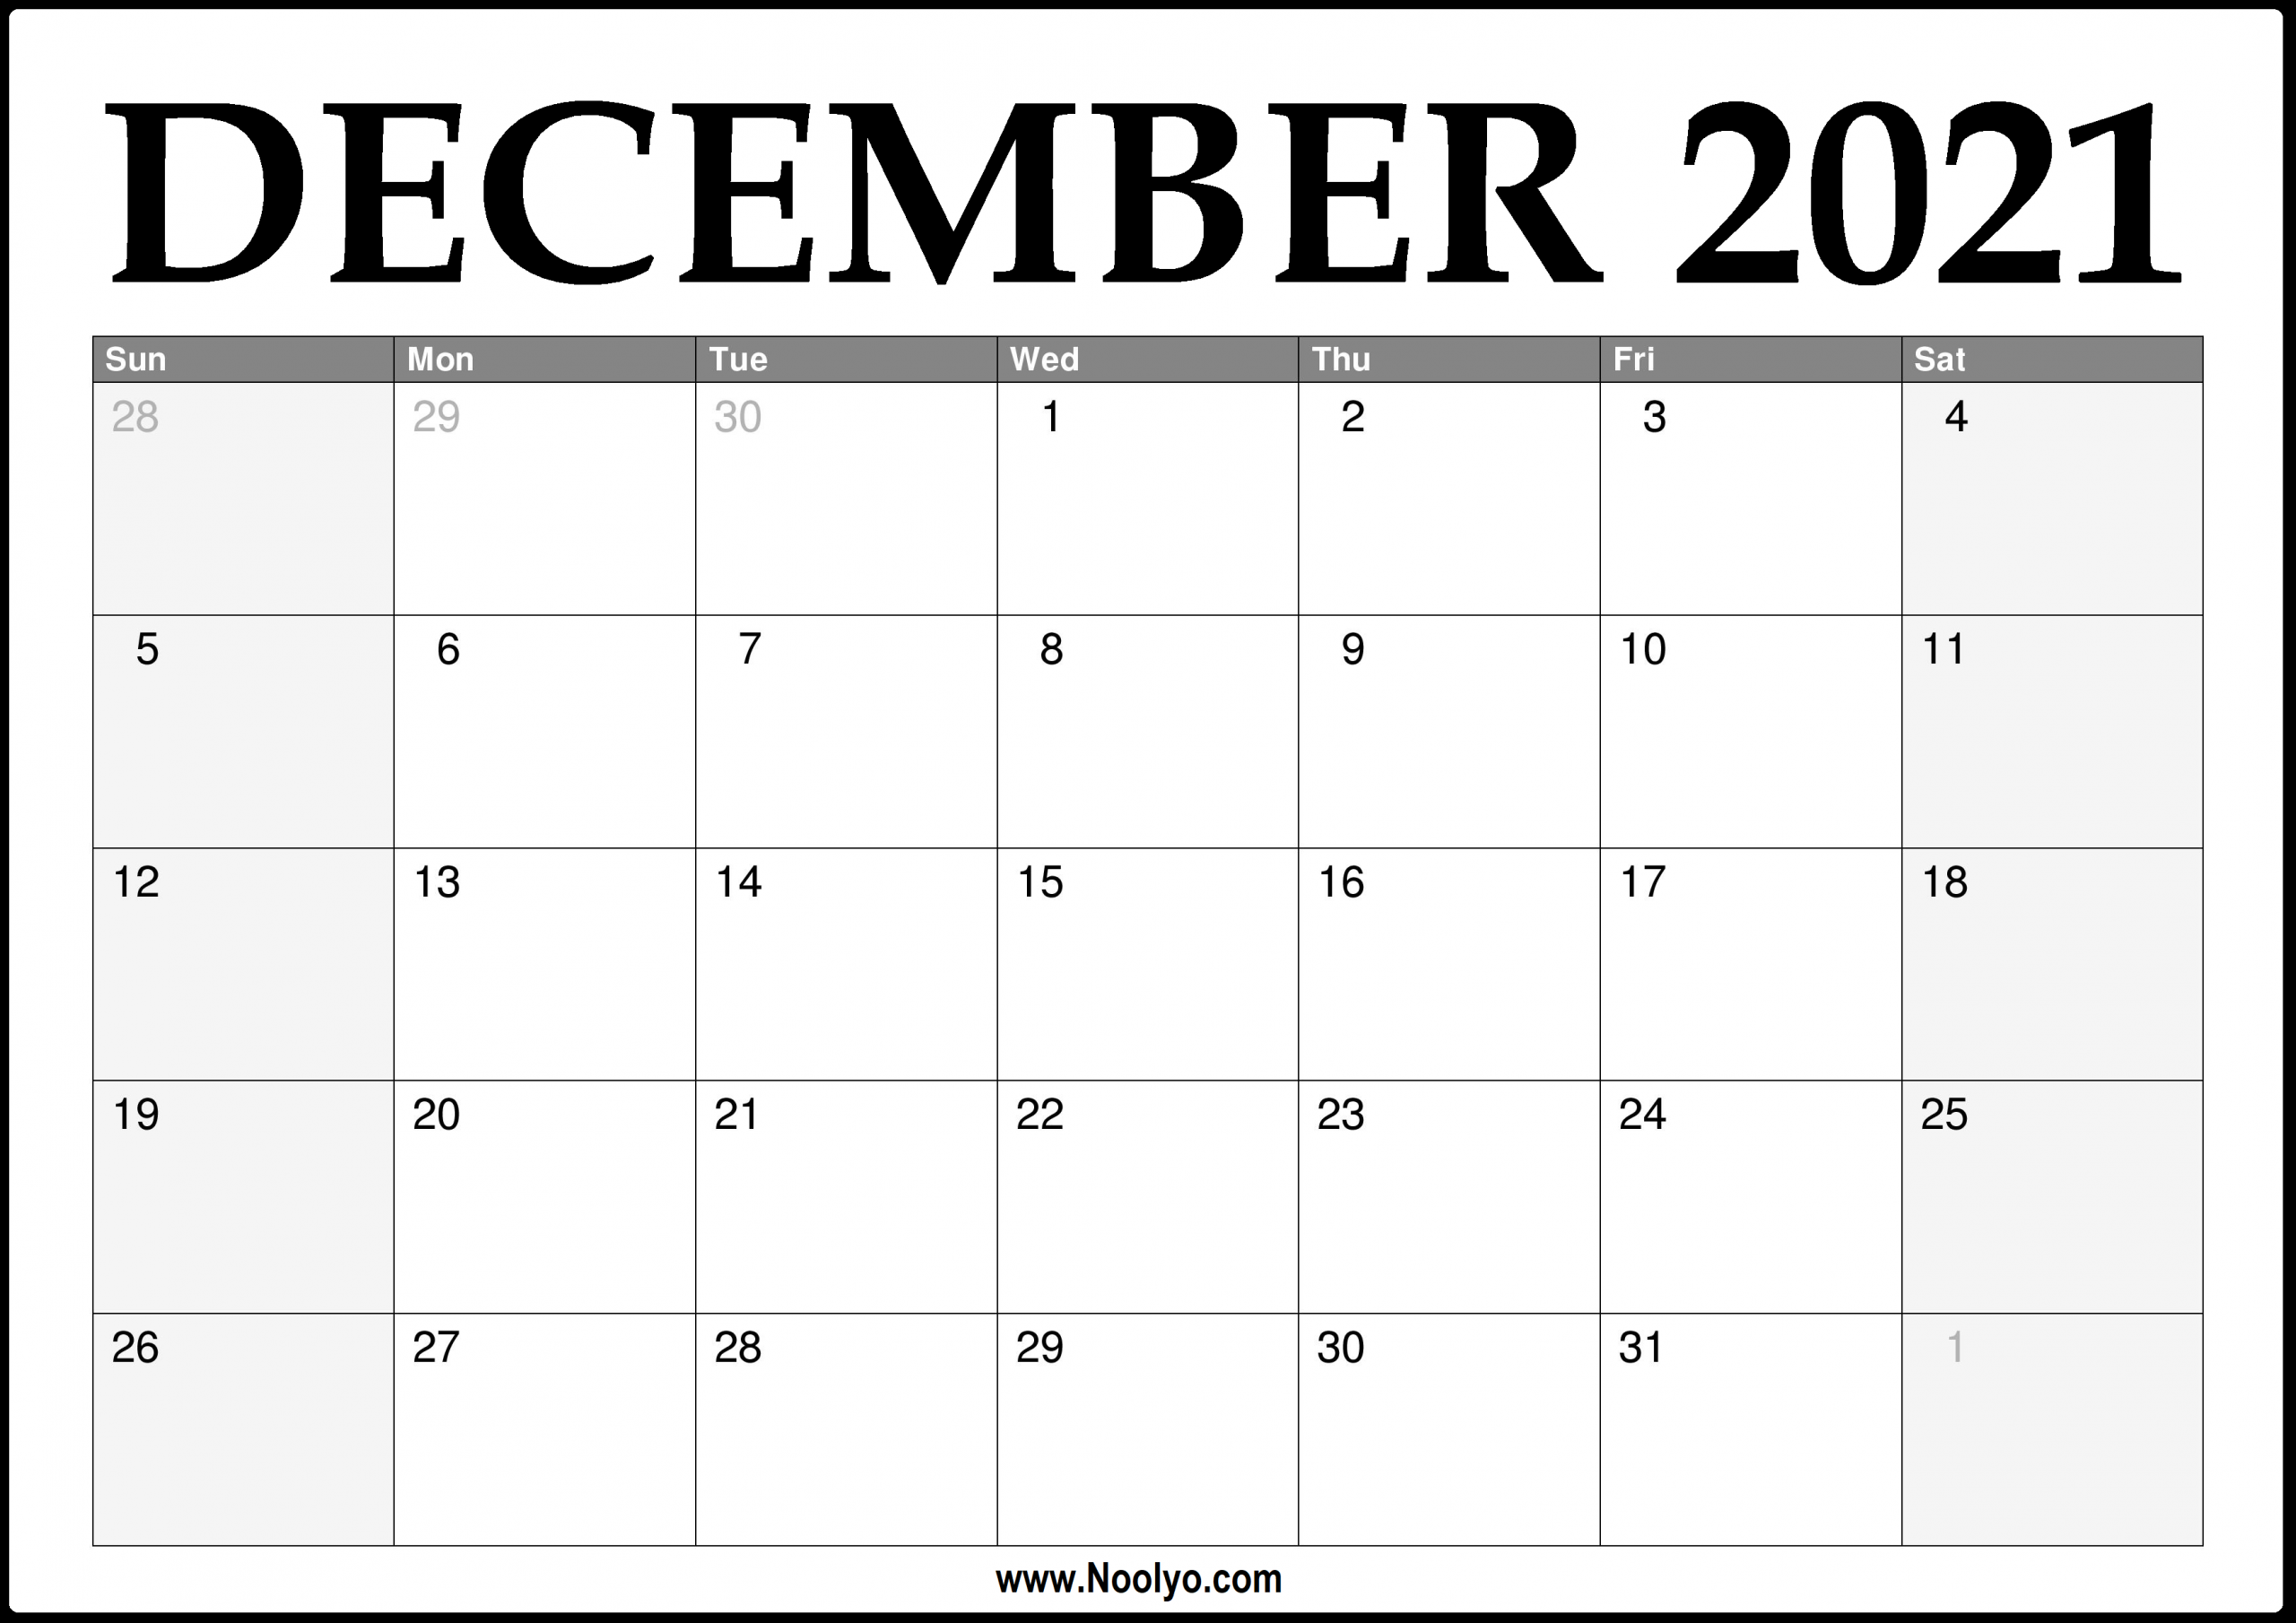 2021 December Calendar Printable - Download Free - Noolyo December 2021 Calendar Printable Free